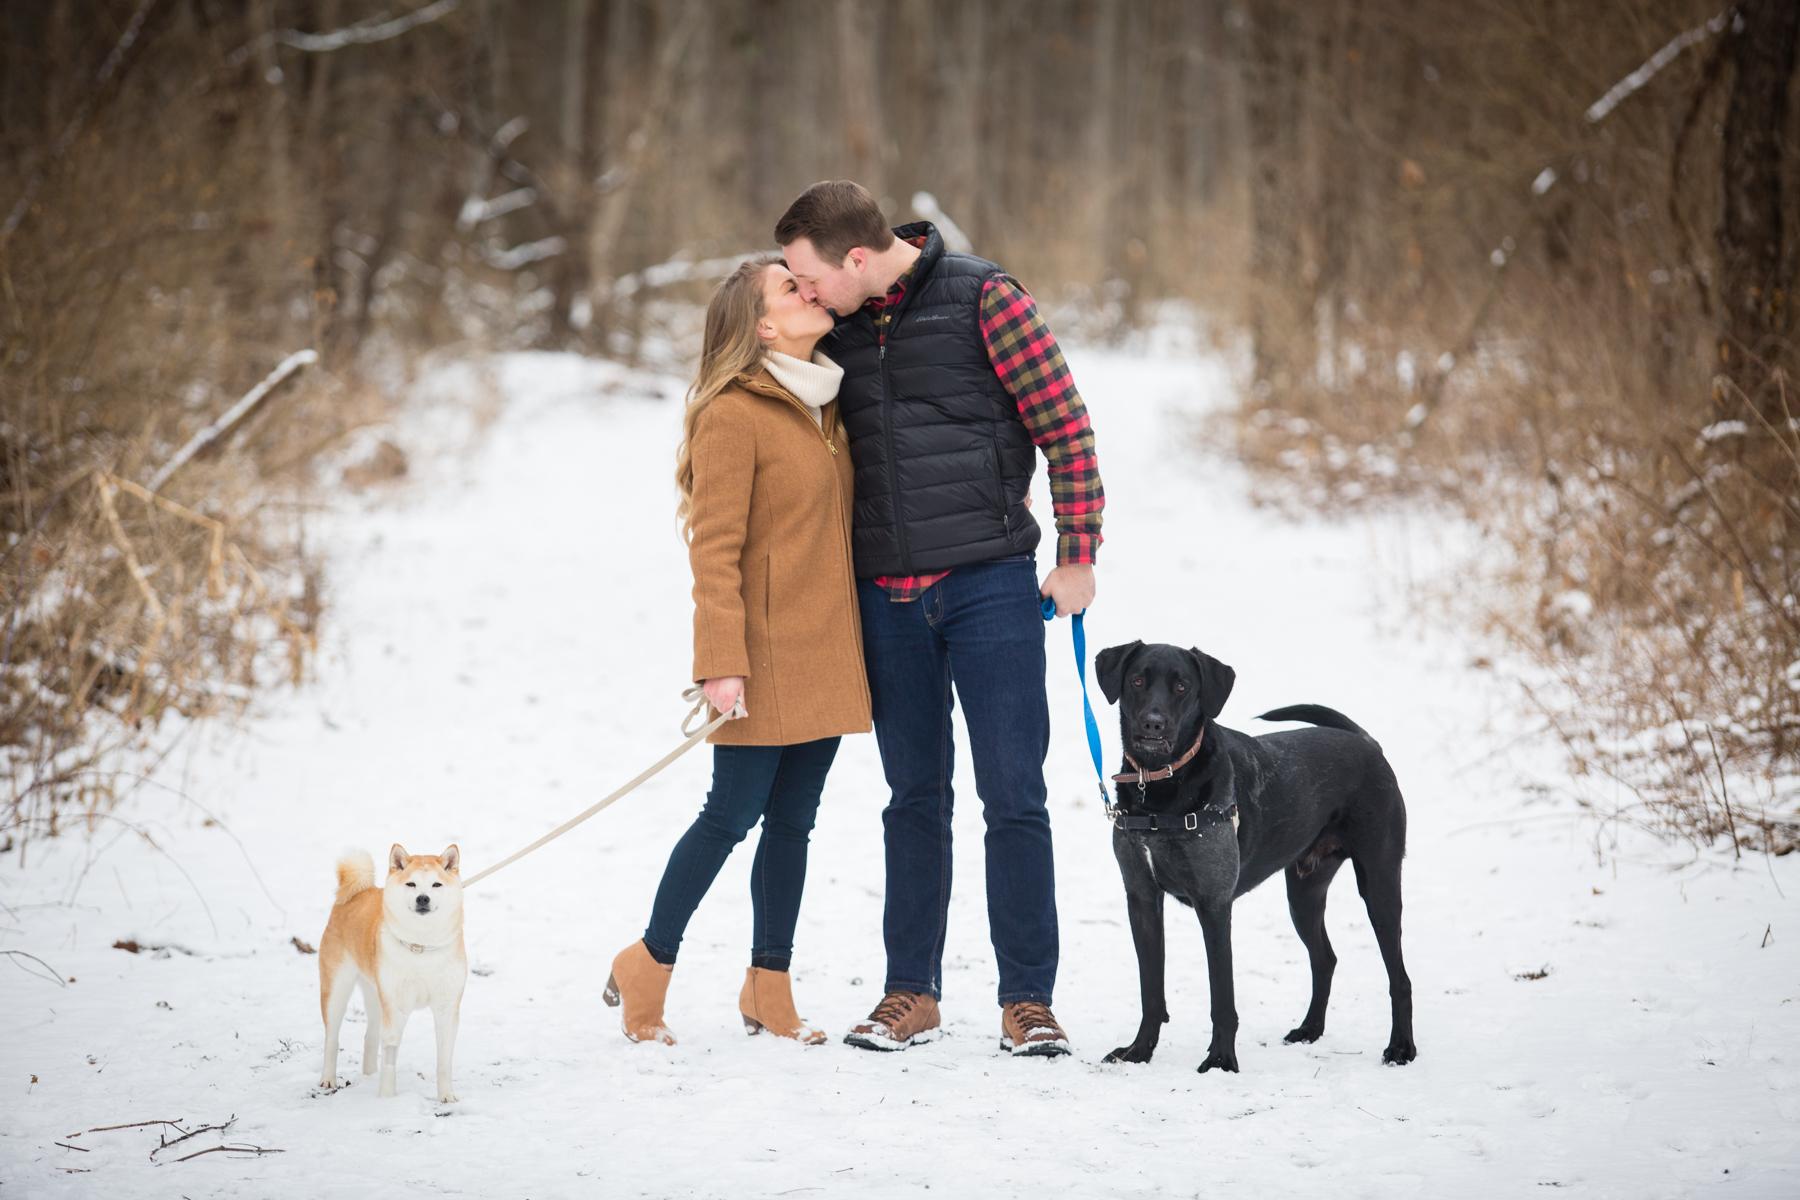 Doug&Kara_winter_Engagment_Photos_Brandon_Shafer_Photography_Blog-8.jpg